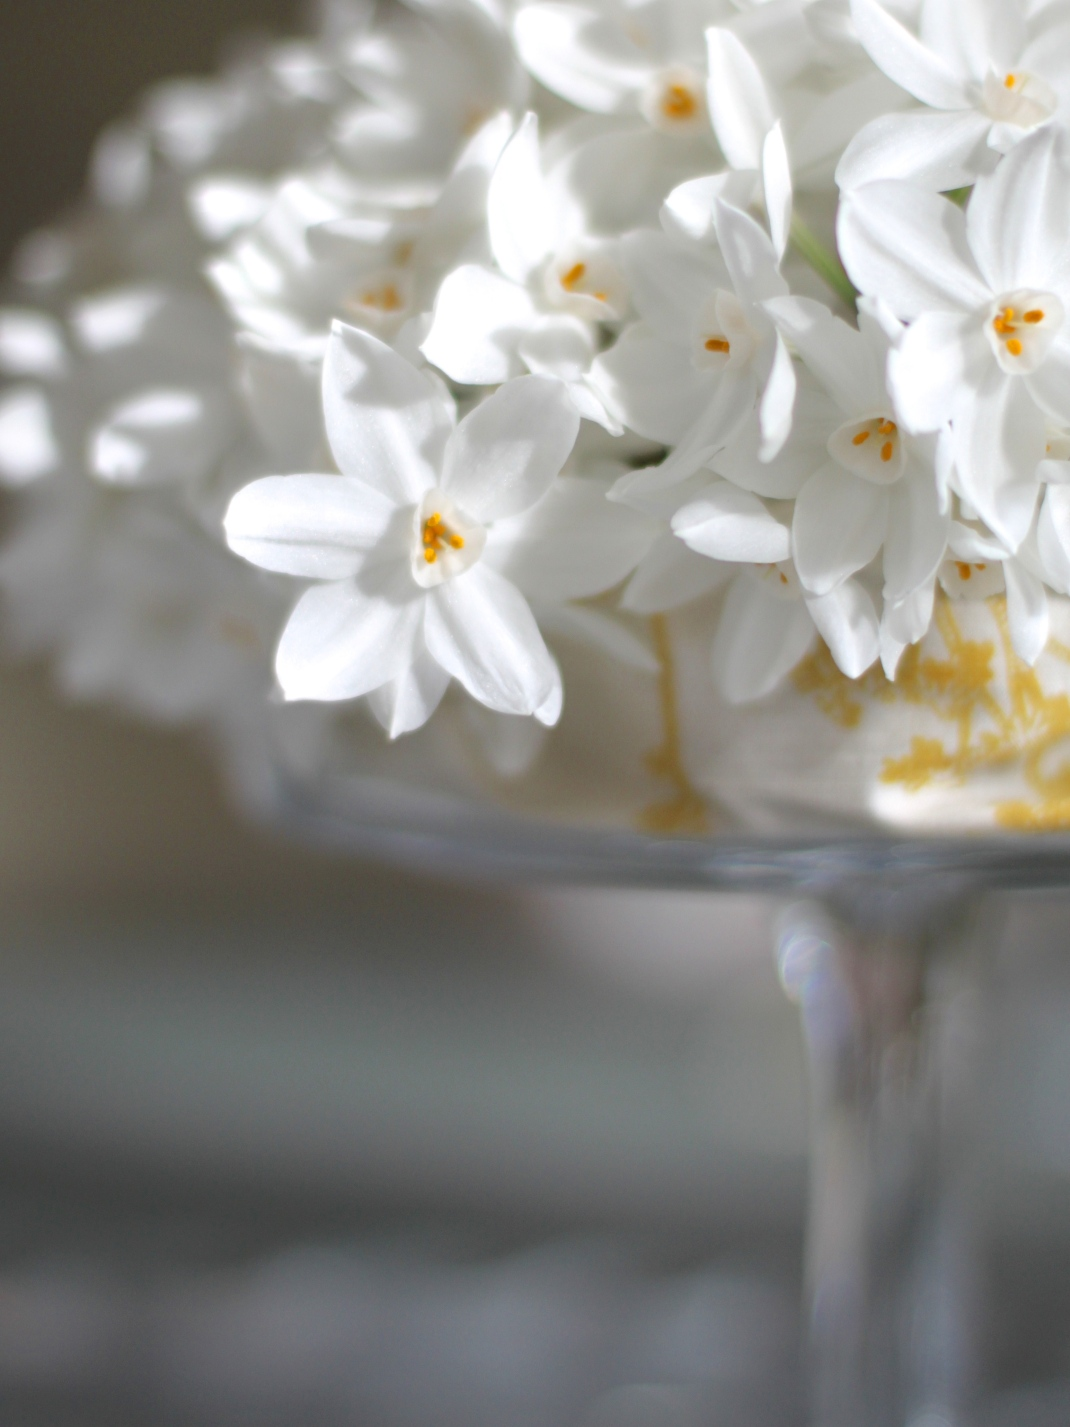 Narcissi Paperwhite